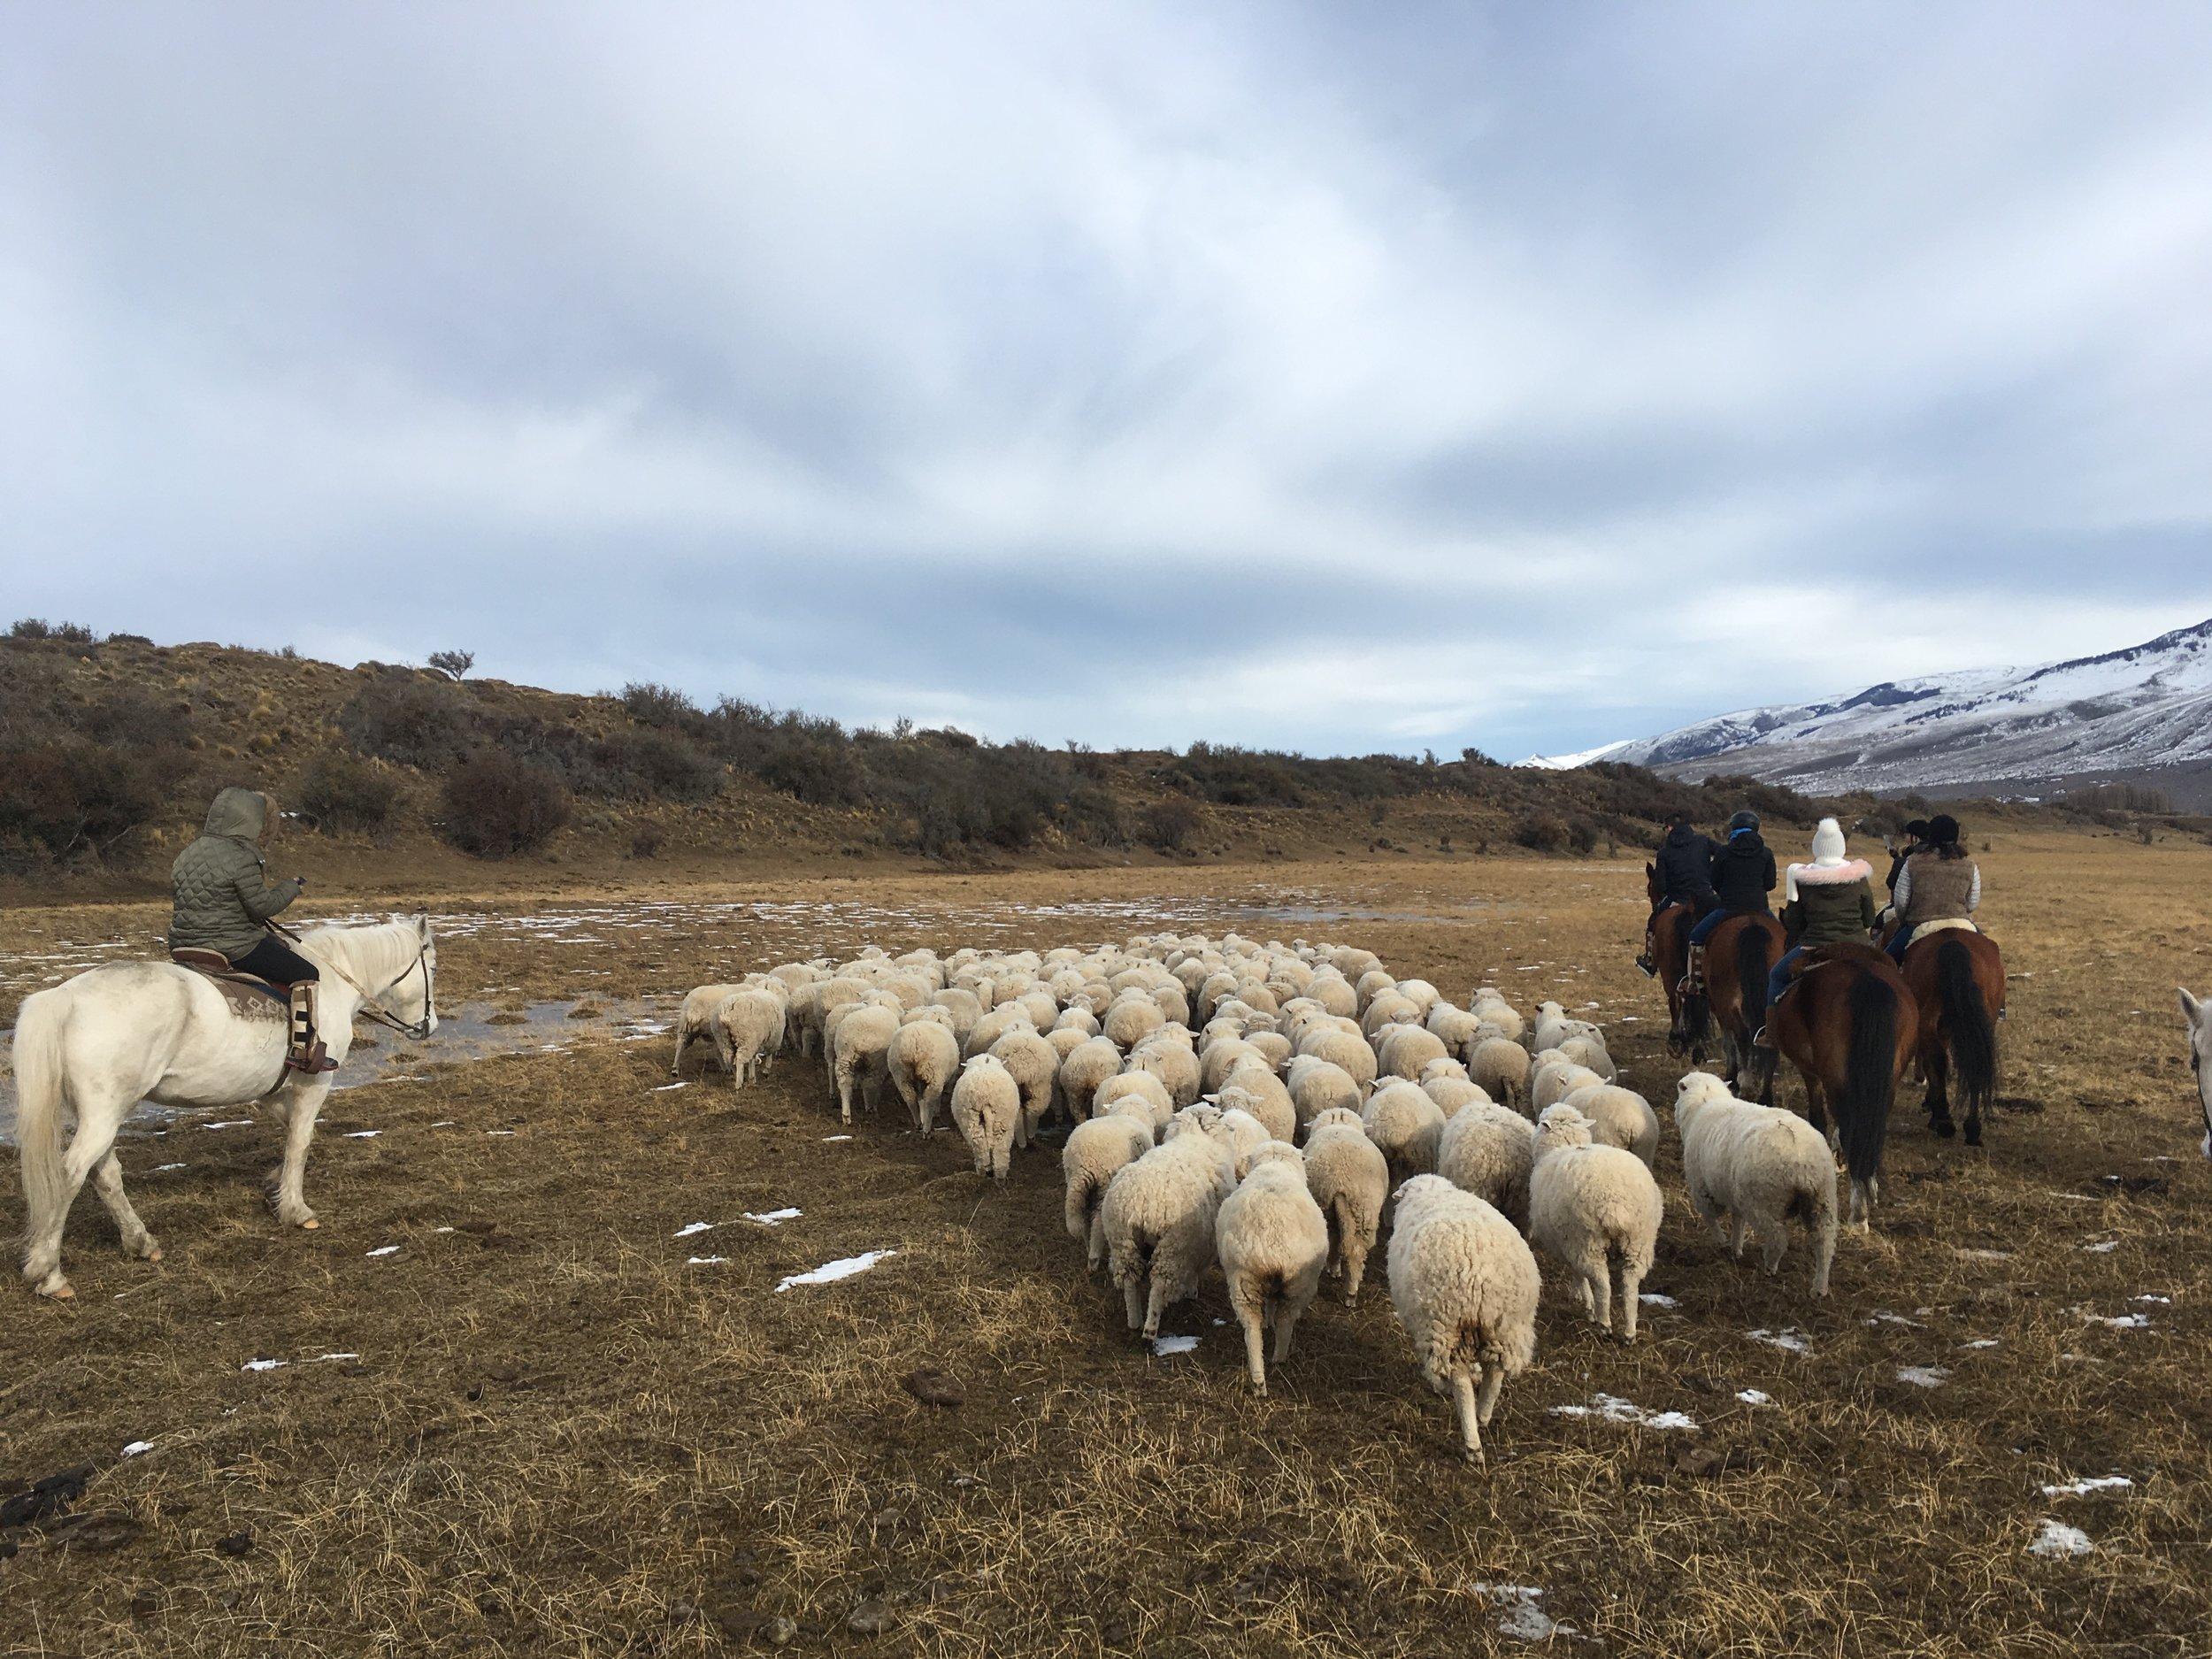 Herding Sheep in Argentina